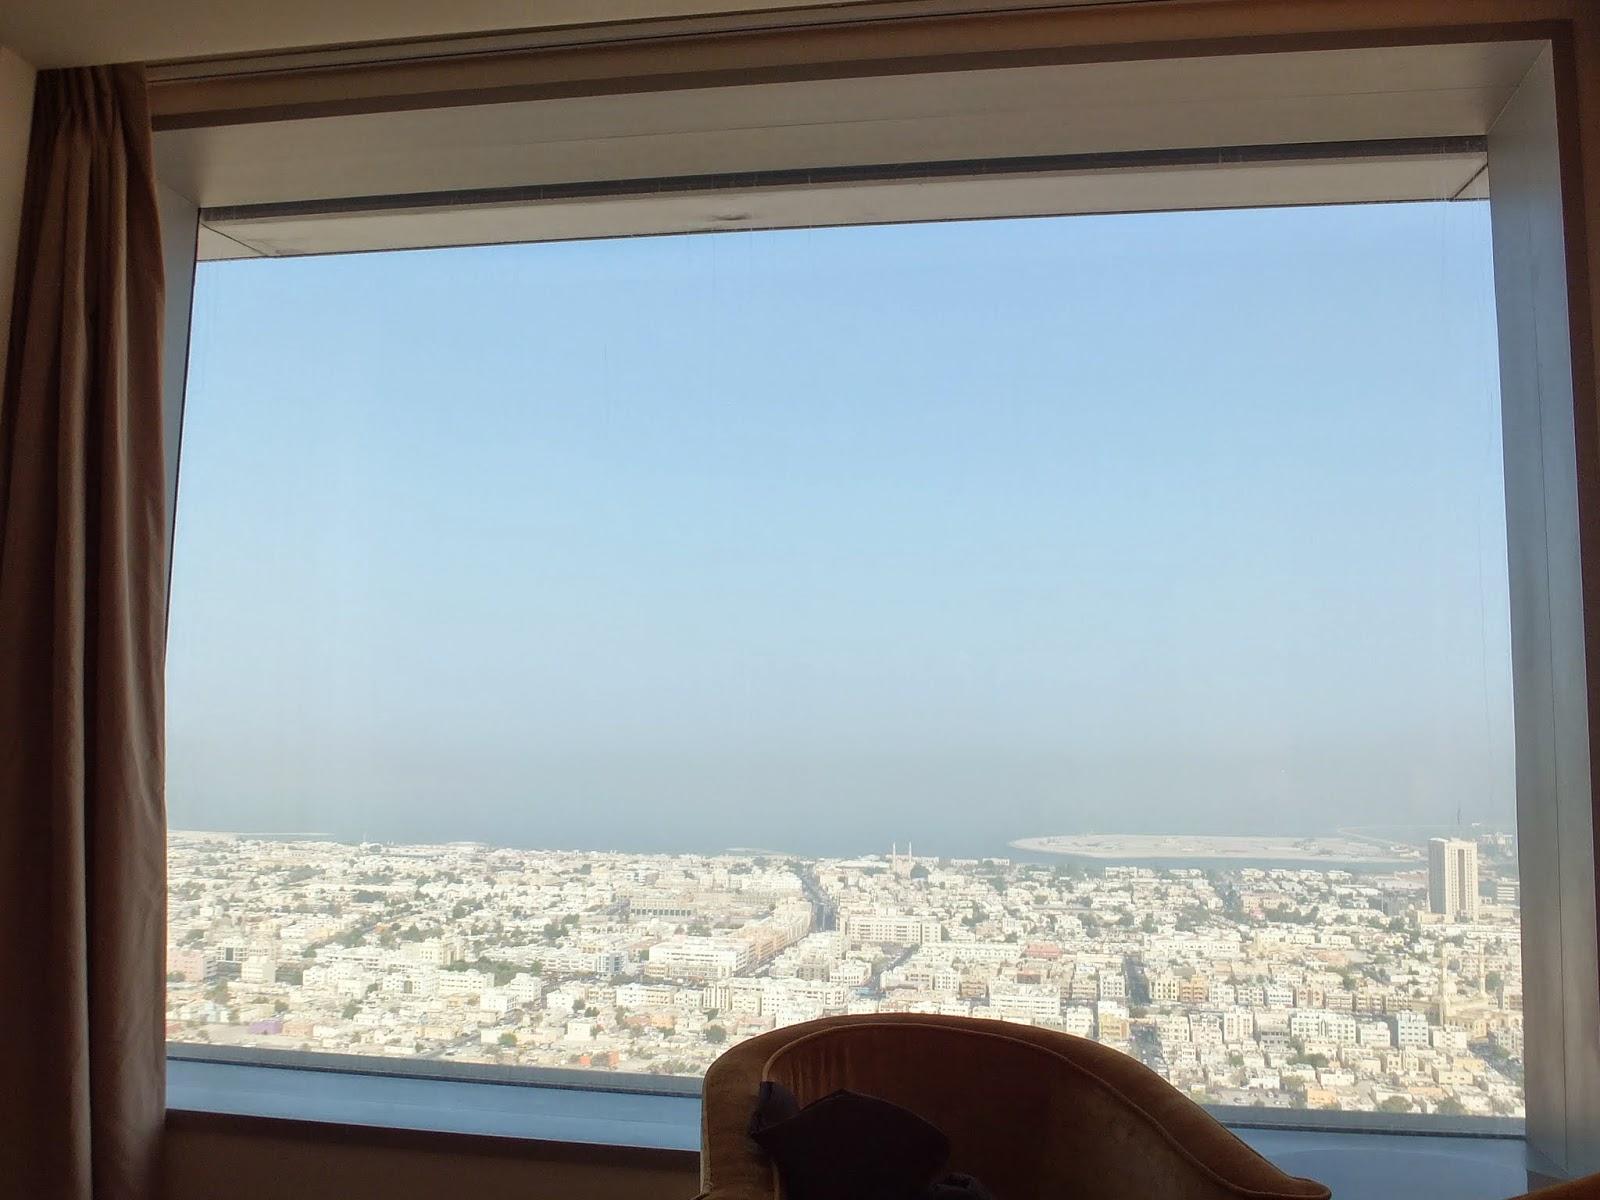 dubai-view ドバイの眺め